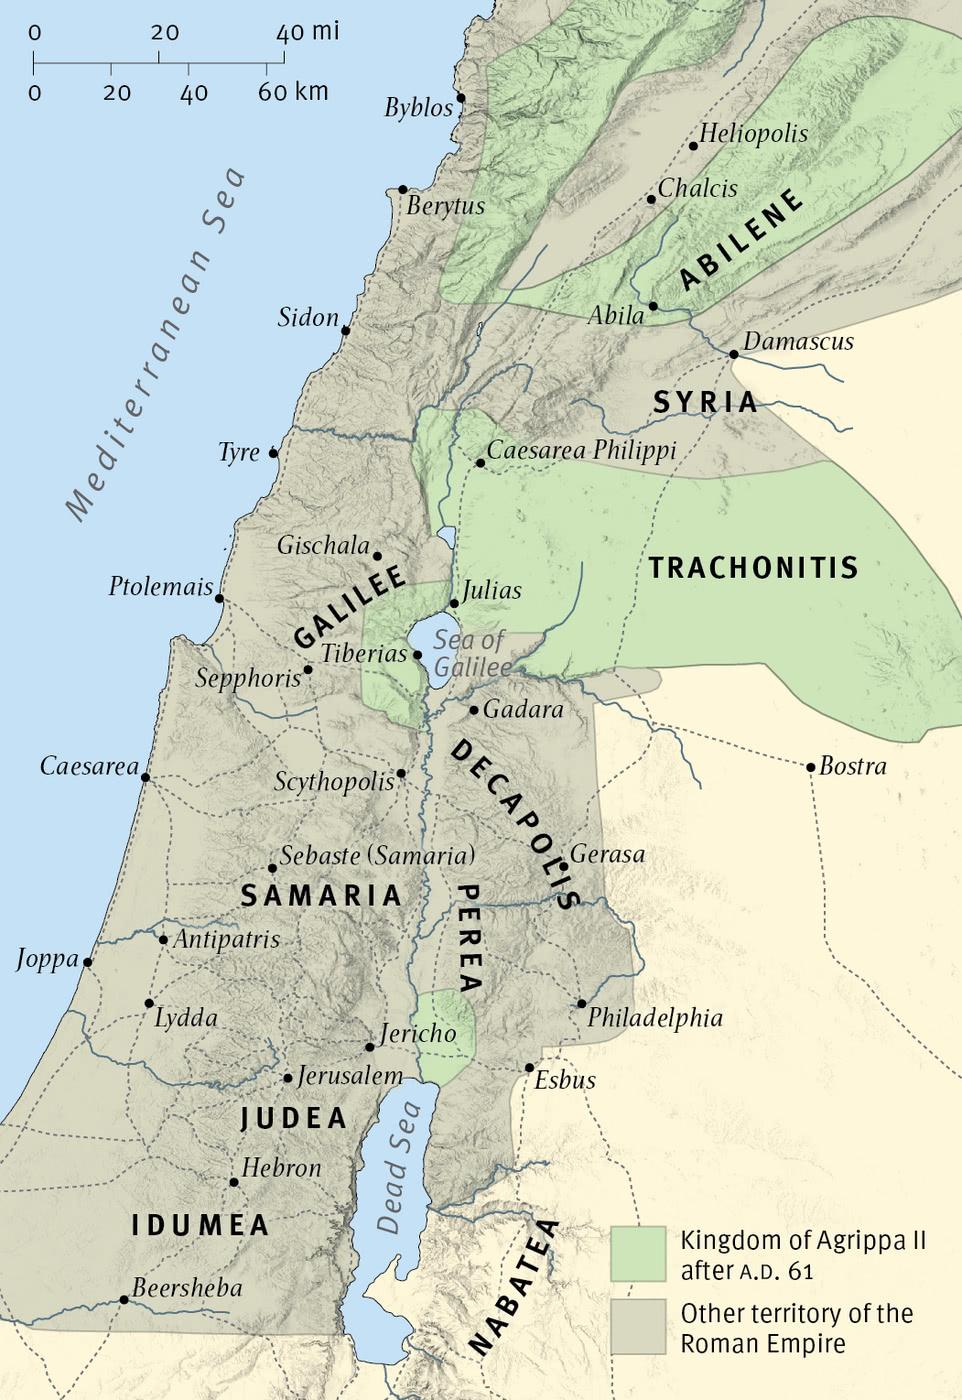 The Kingdom of Herod Agrippa II